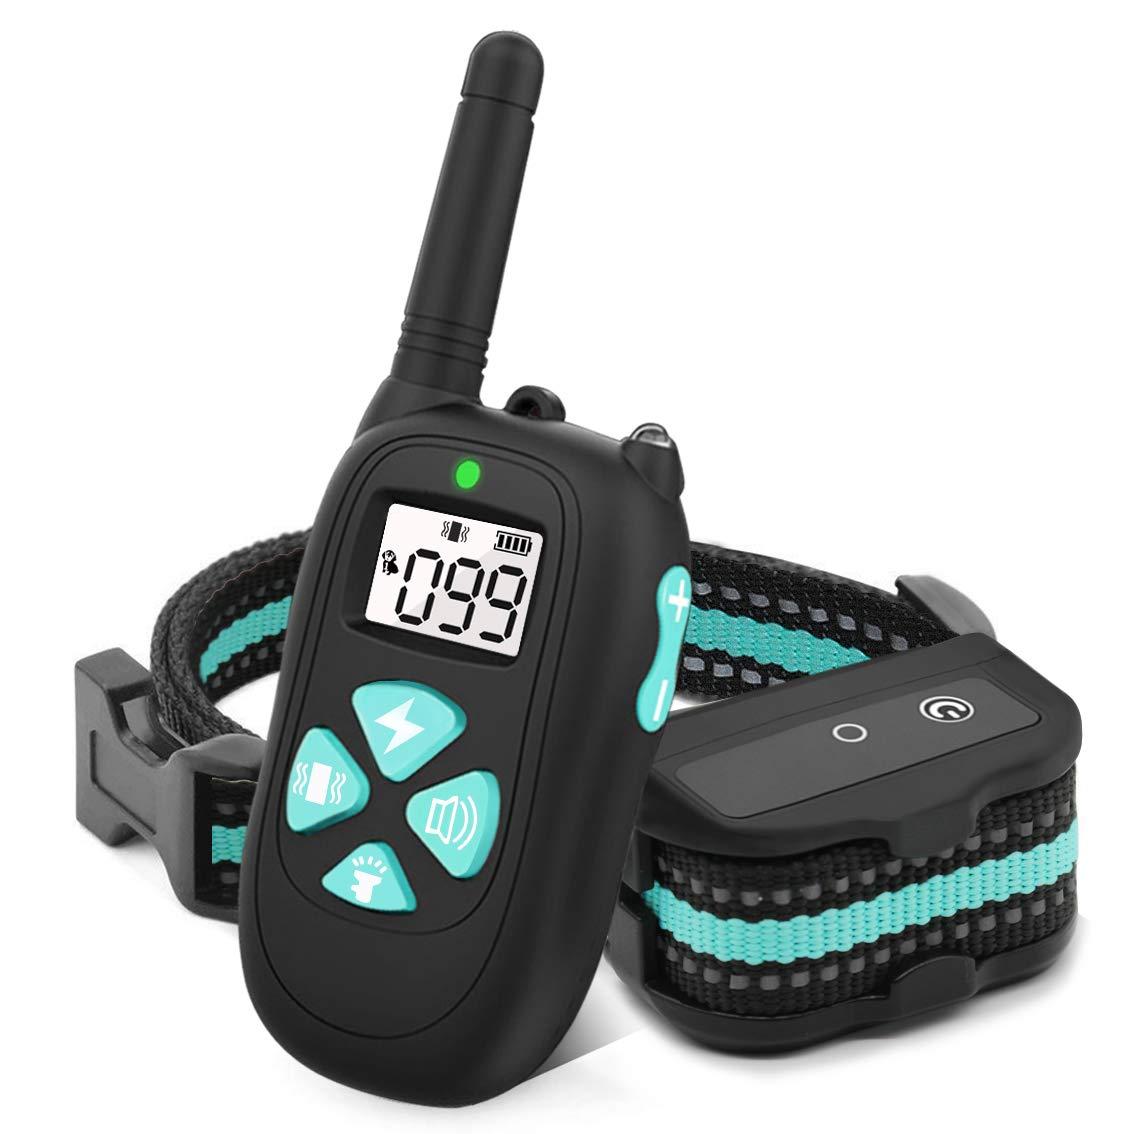 HappyT Dog Training Collar with Remote, Dog Shock Collar, 3 Training Modes, Beep Vibra Electric Shock, 1450Ft Remote Range, 1-100 Levels Waterproof Dog Training Set